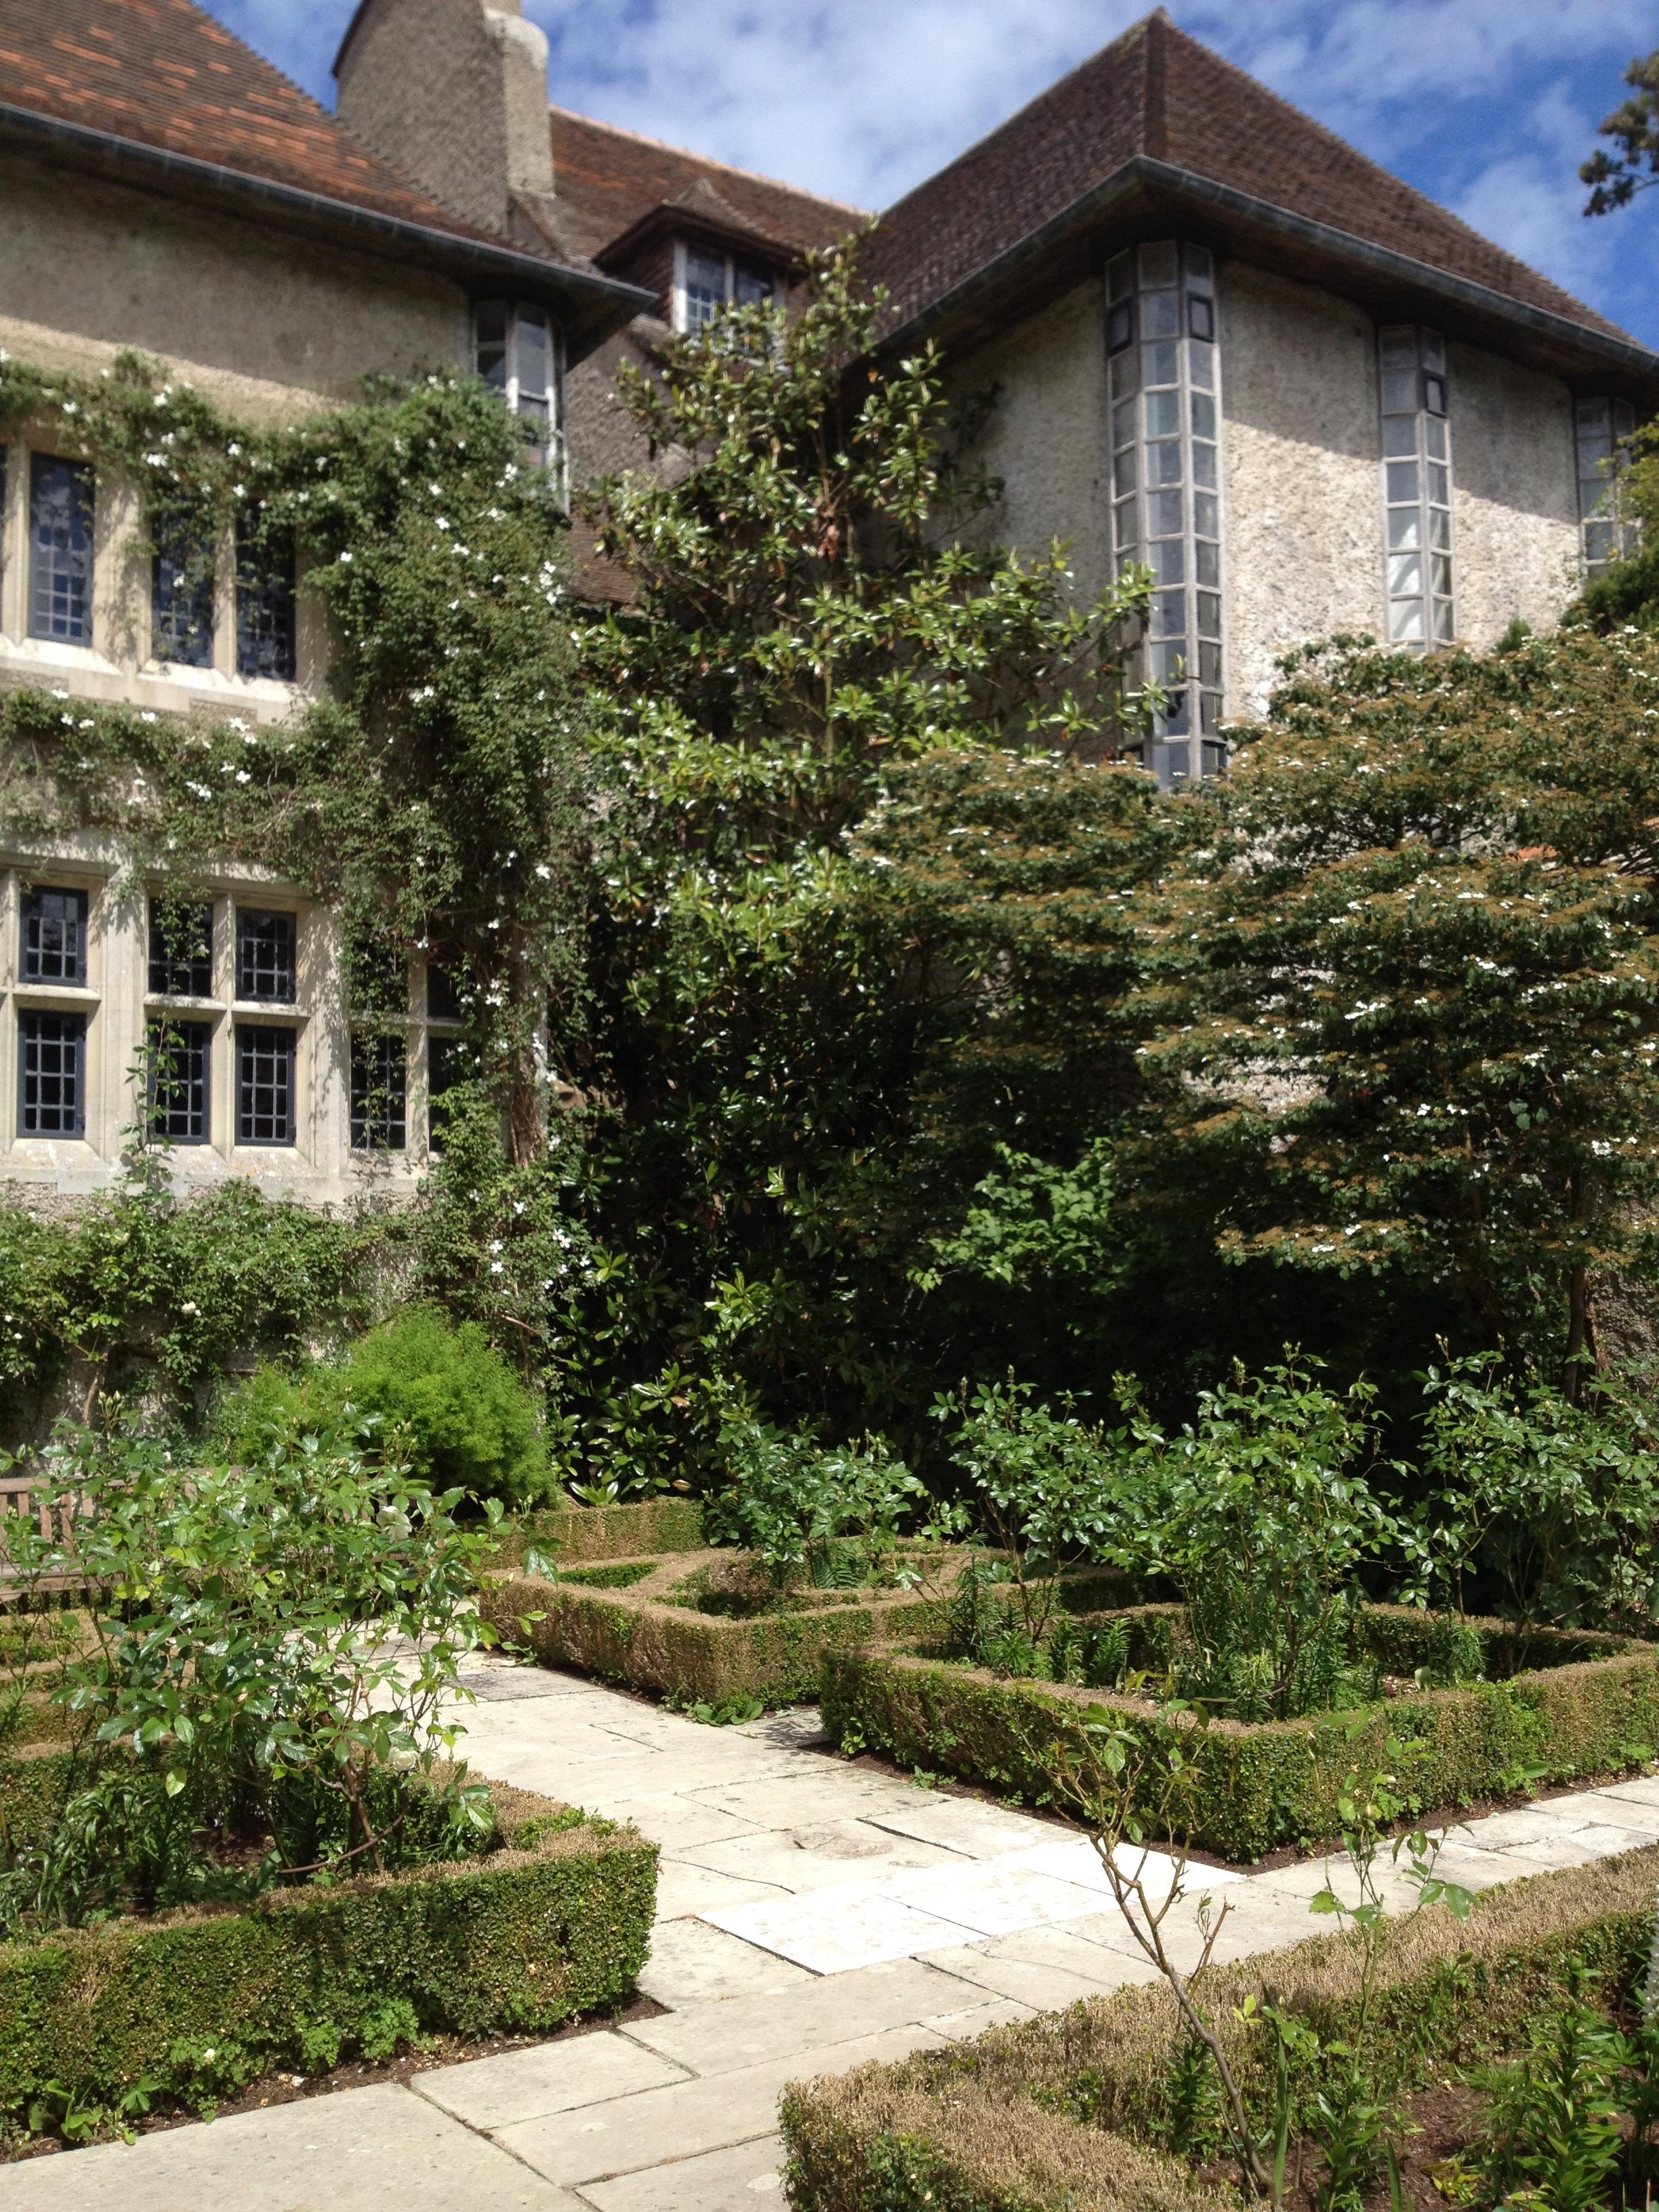 Gertrude jekyll chaumierelesiris Children and gardens gertrude jekyll